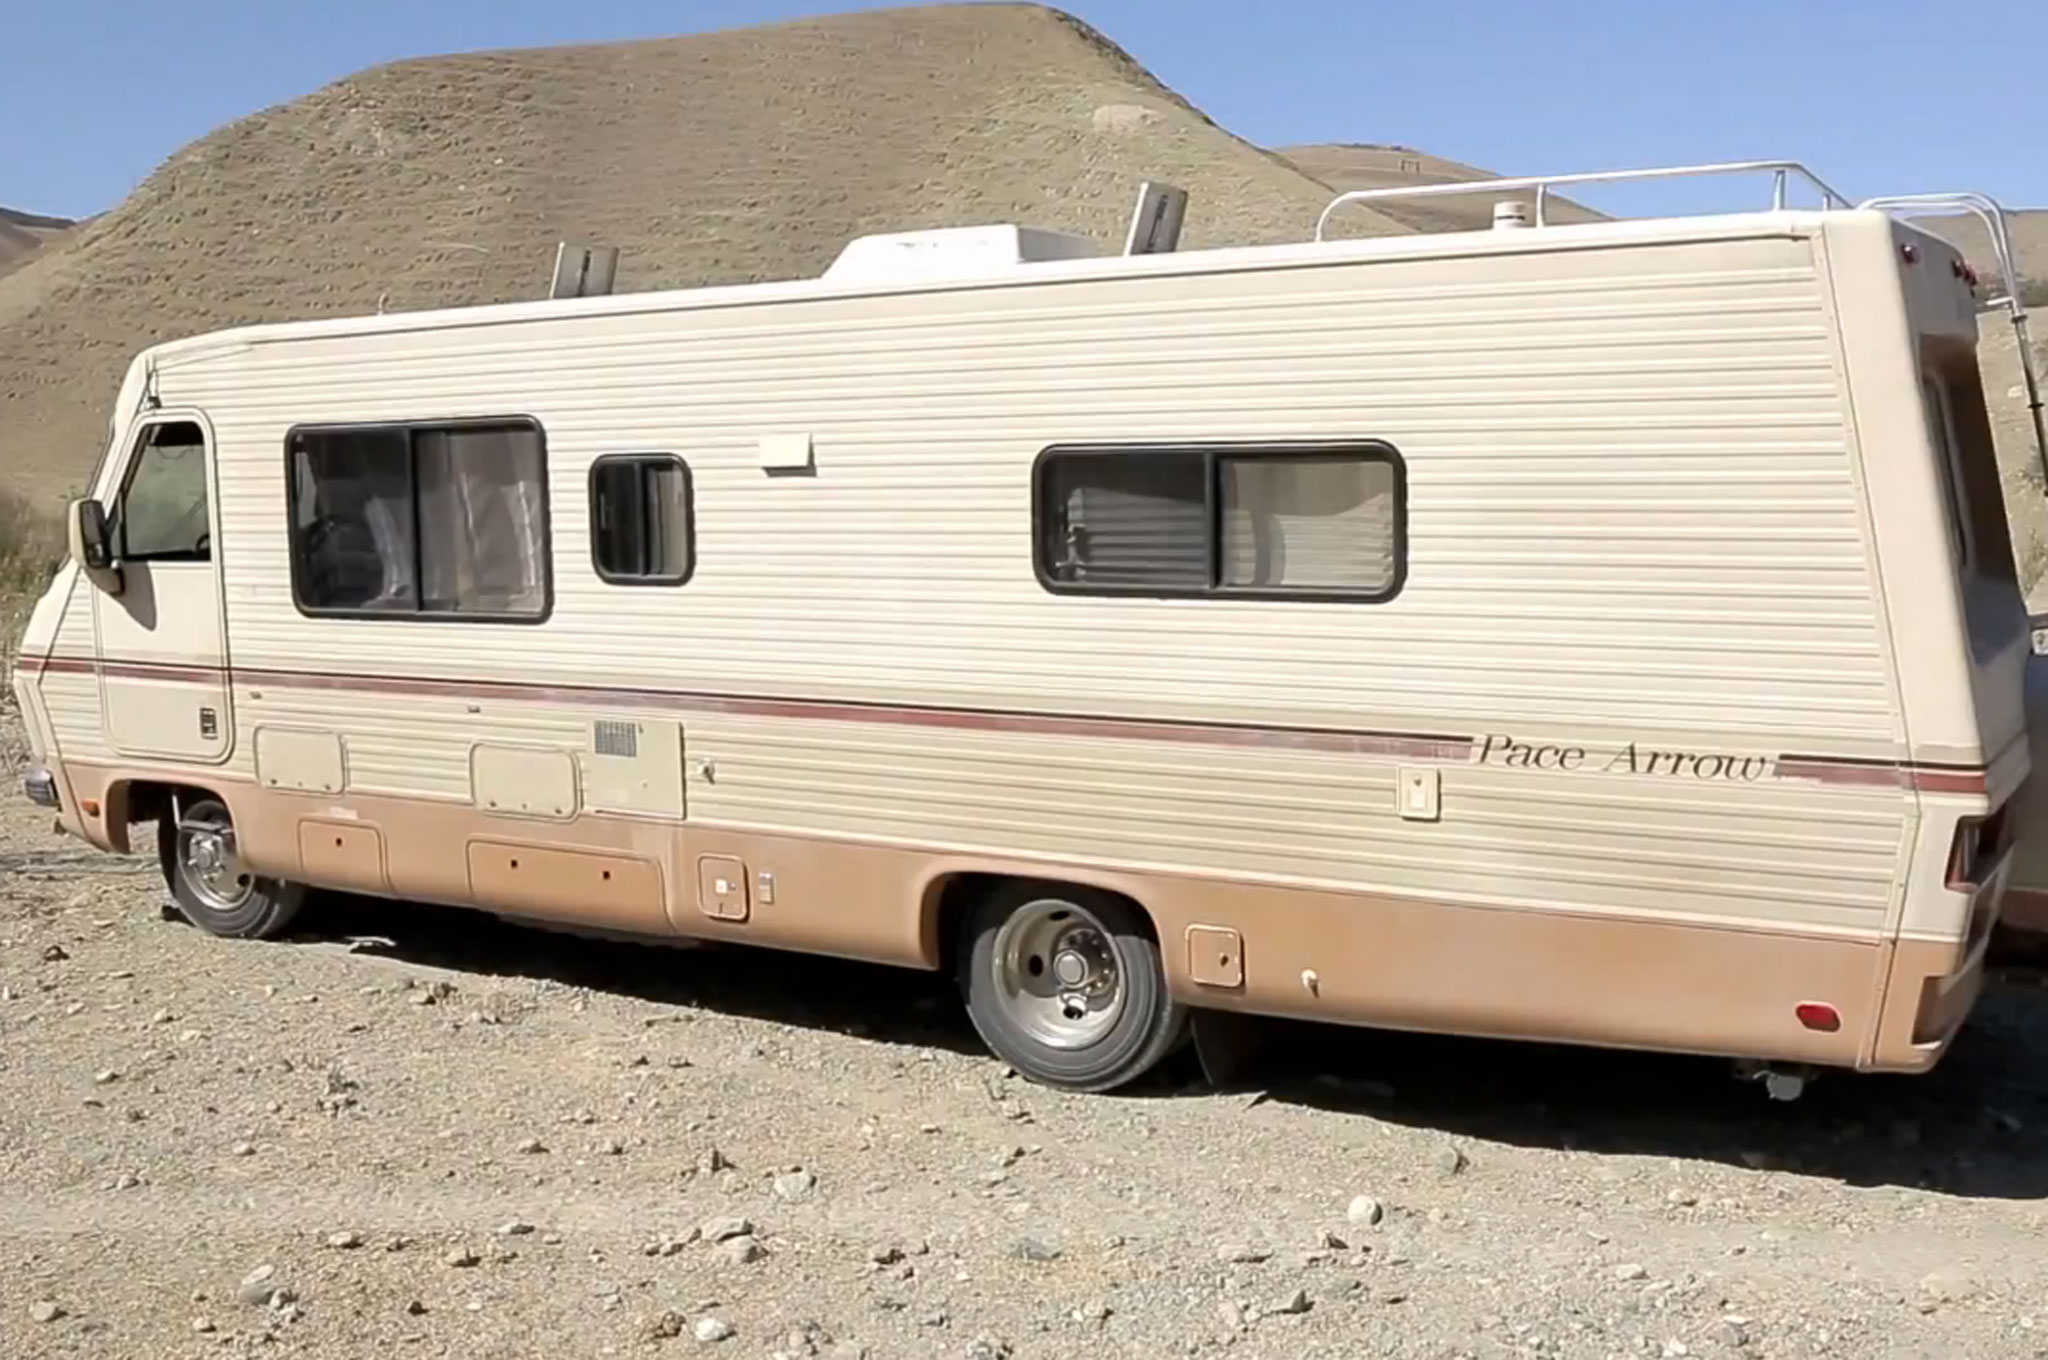 Video: 2010 Sportsmobile 4x4 Van, 1986 Pace Arrow RV